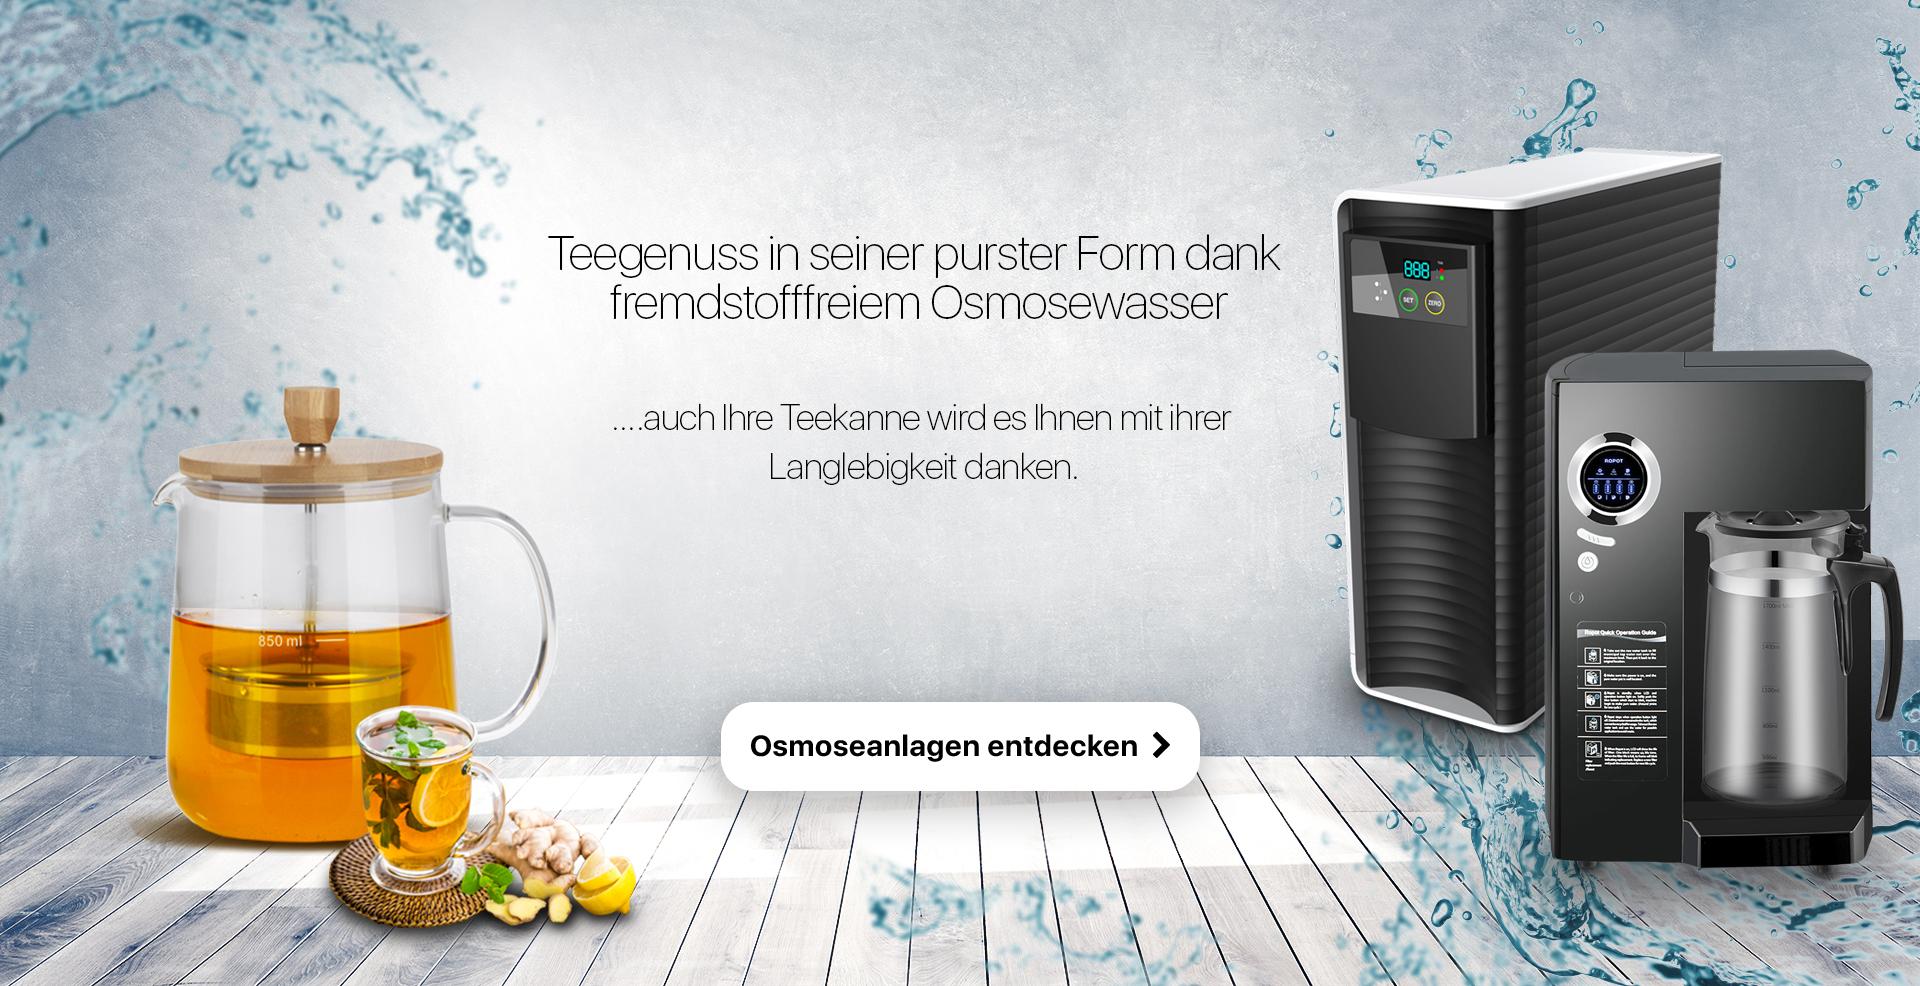 Osmosewasser_ohne-Samoware_07085bcurJrY3Teo3G